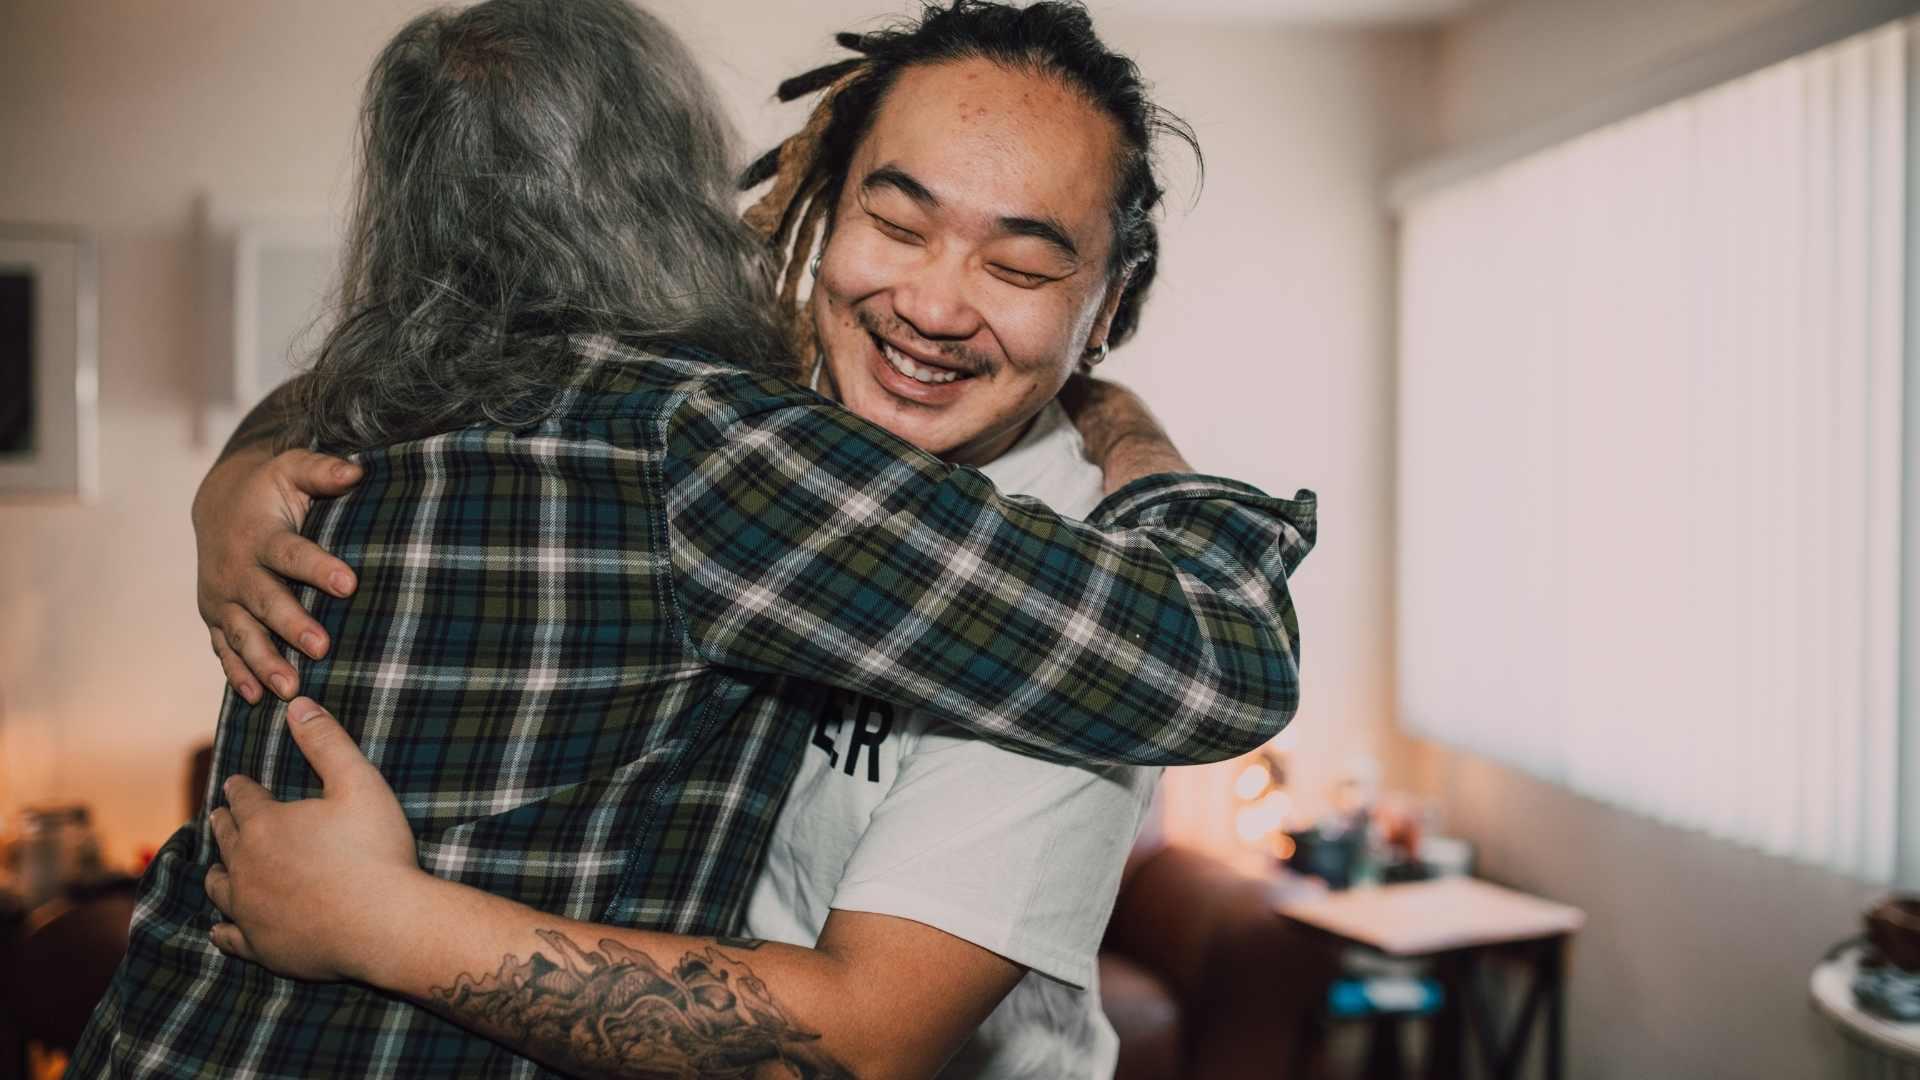 Why Volunteer? Discover 12 Surprising Benefits of Volunteering